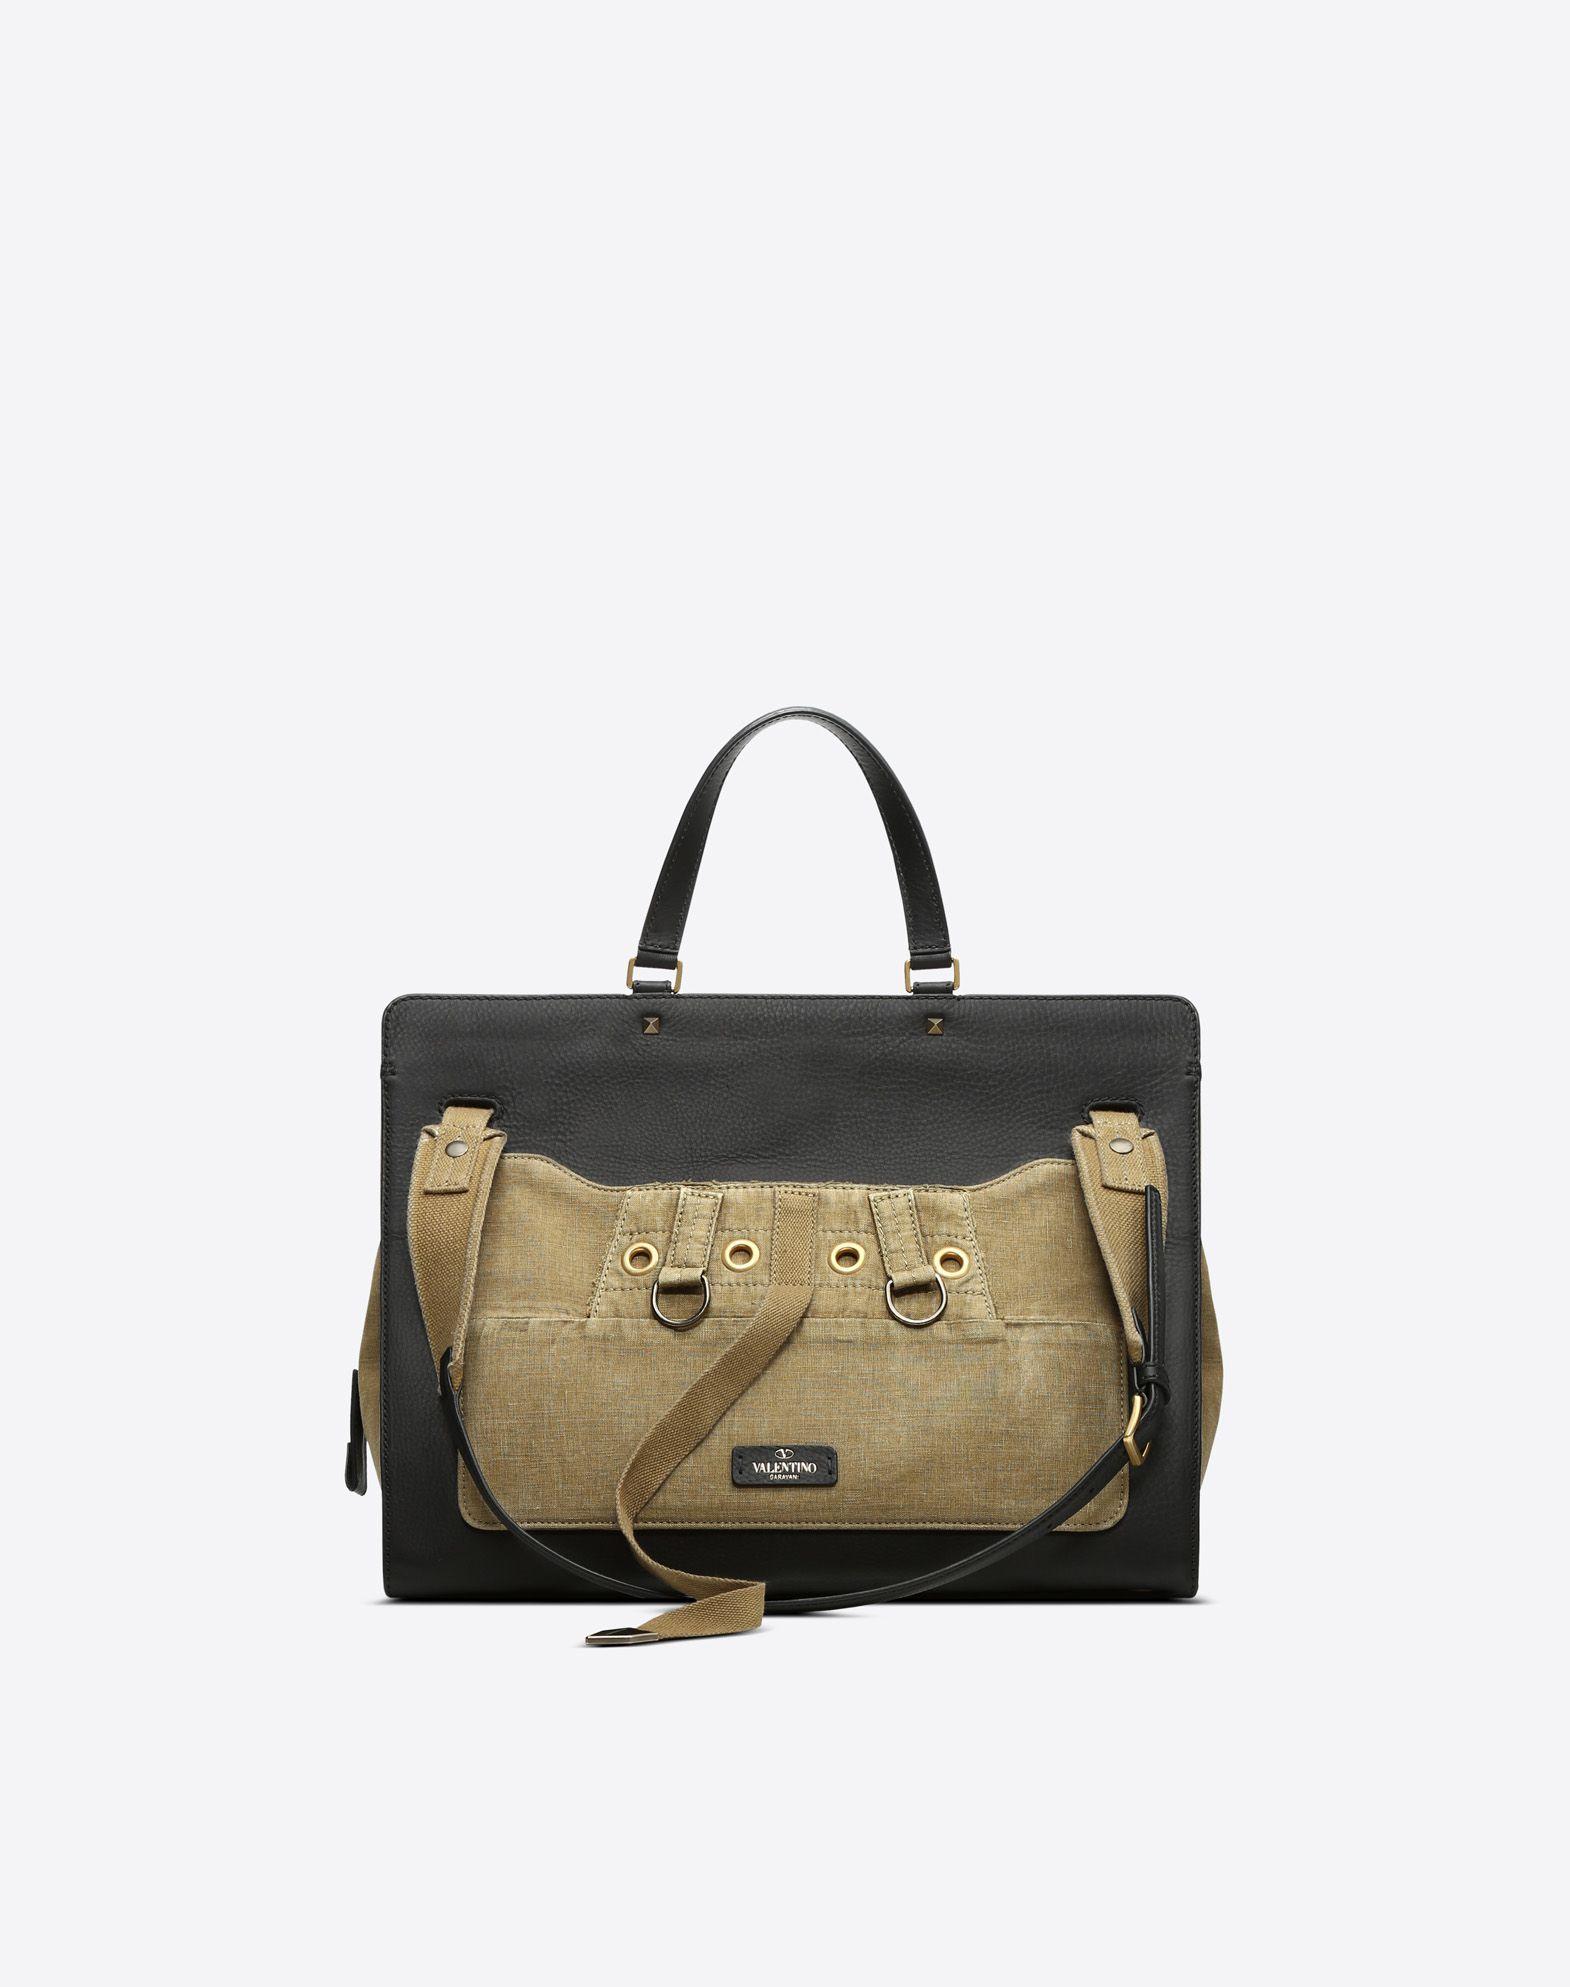 VALENTINO GARAVANI Joylock Maxi Handle Bag HANDBAG D d